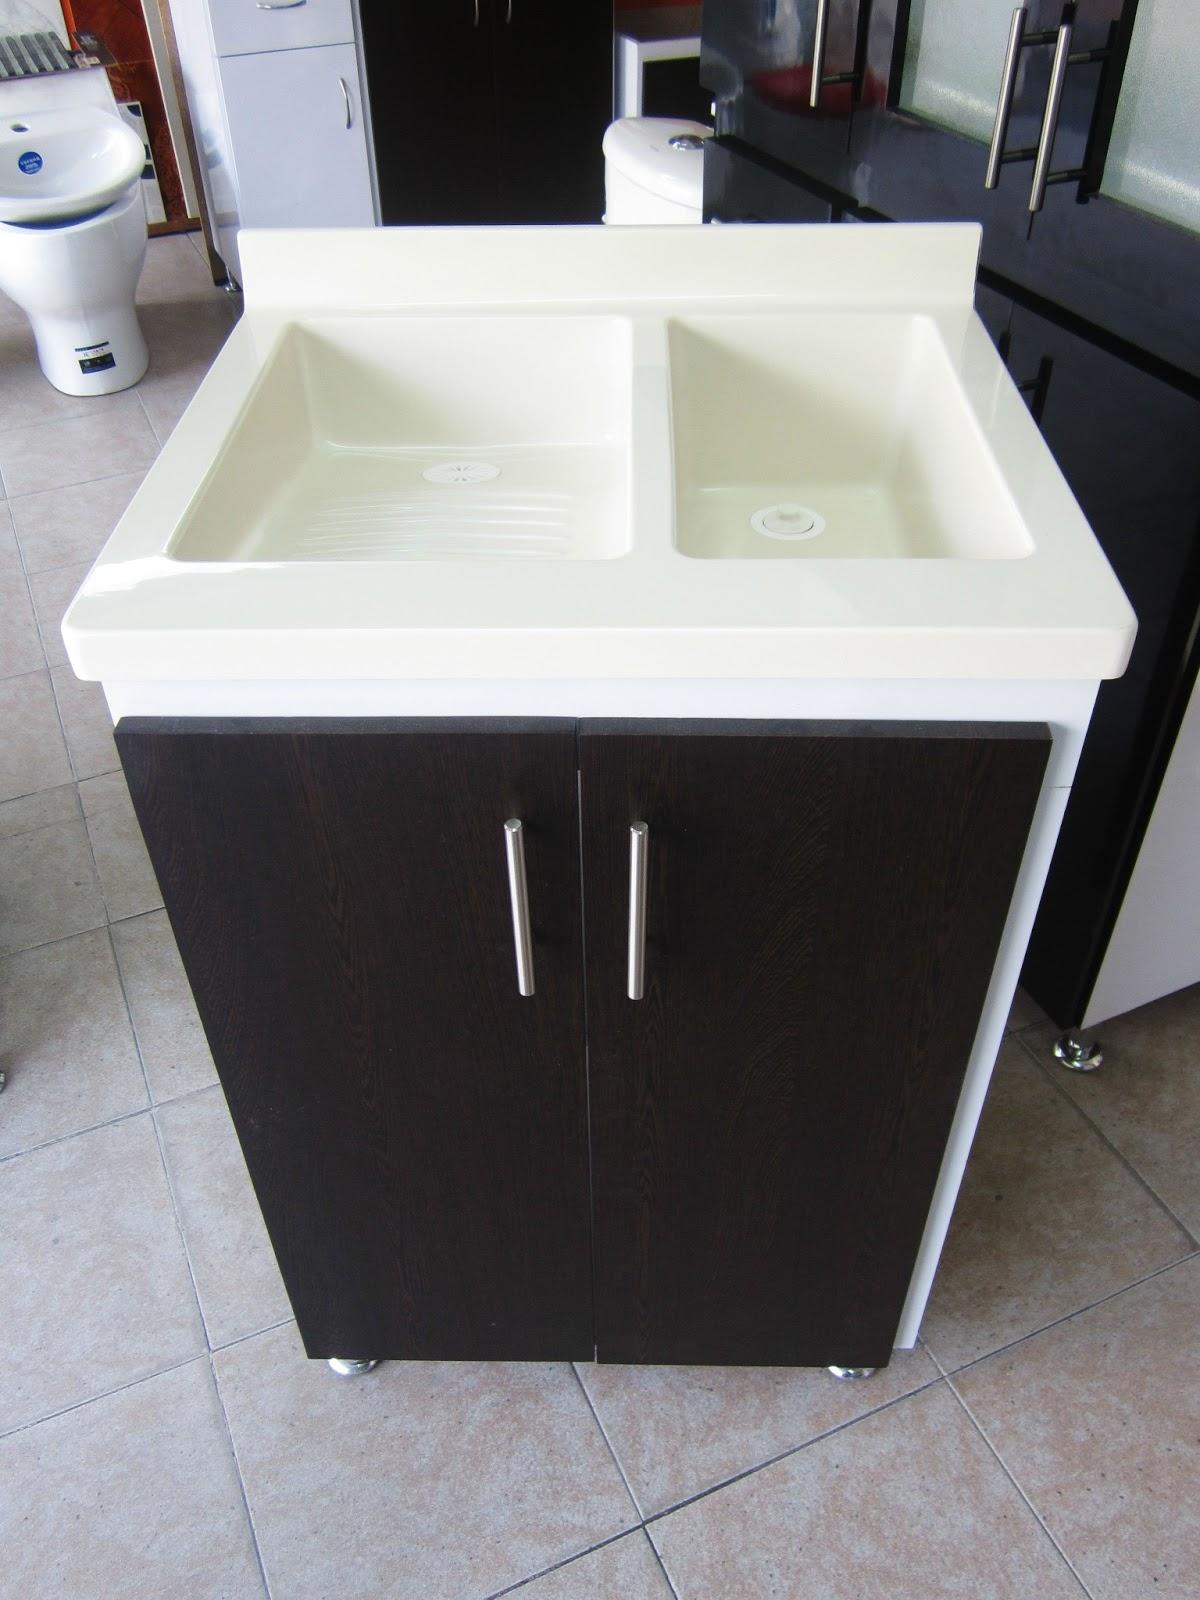 Muebles plastico bogota 20170824132143 for Lavadero para bano